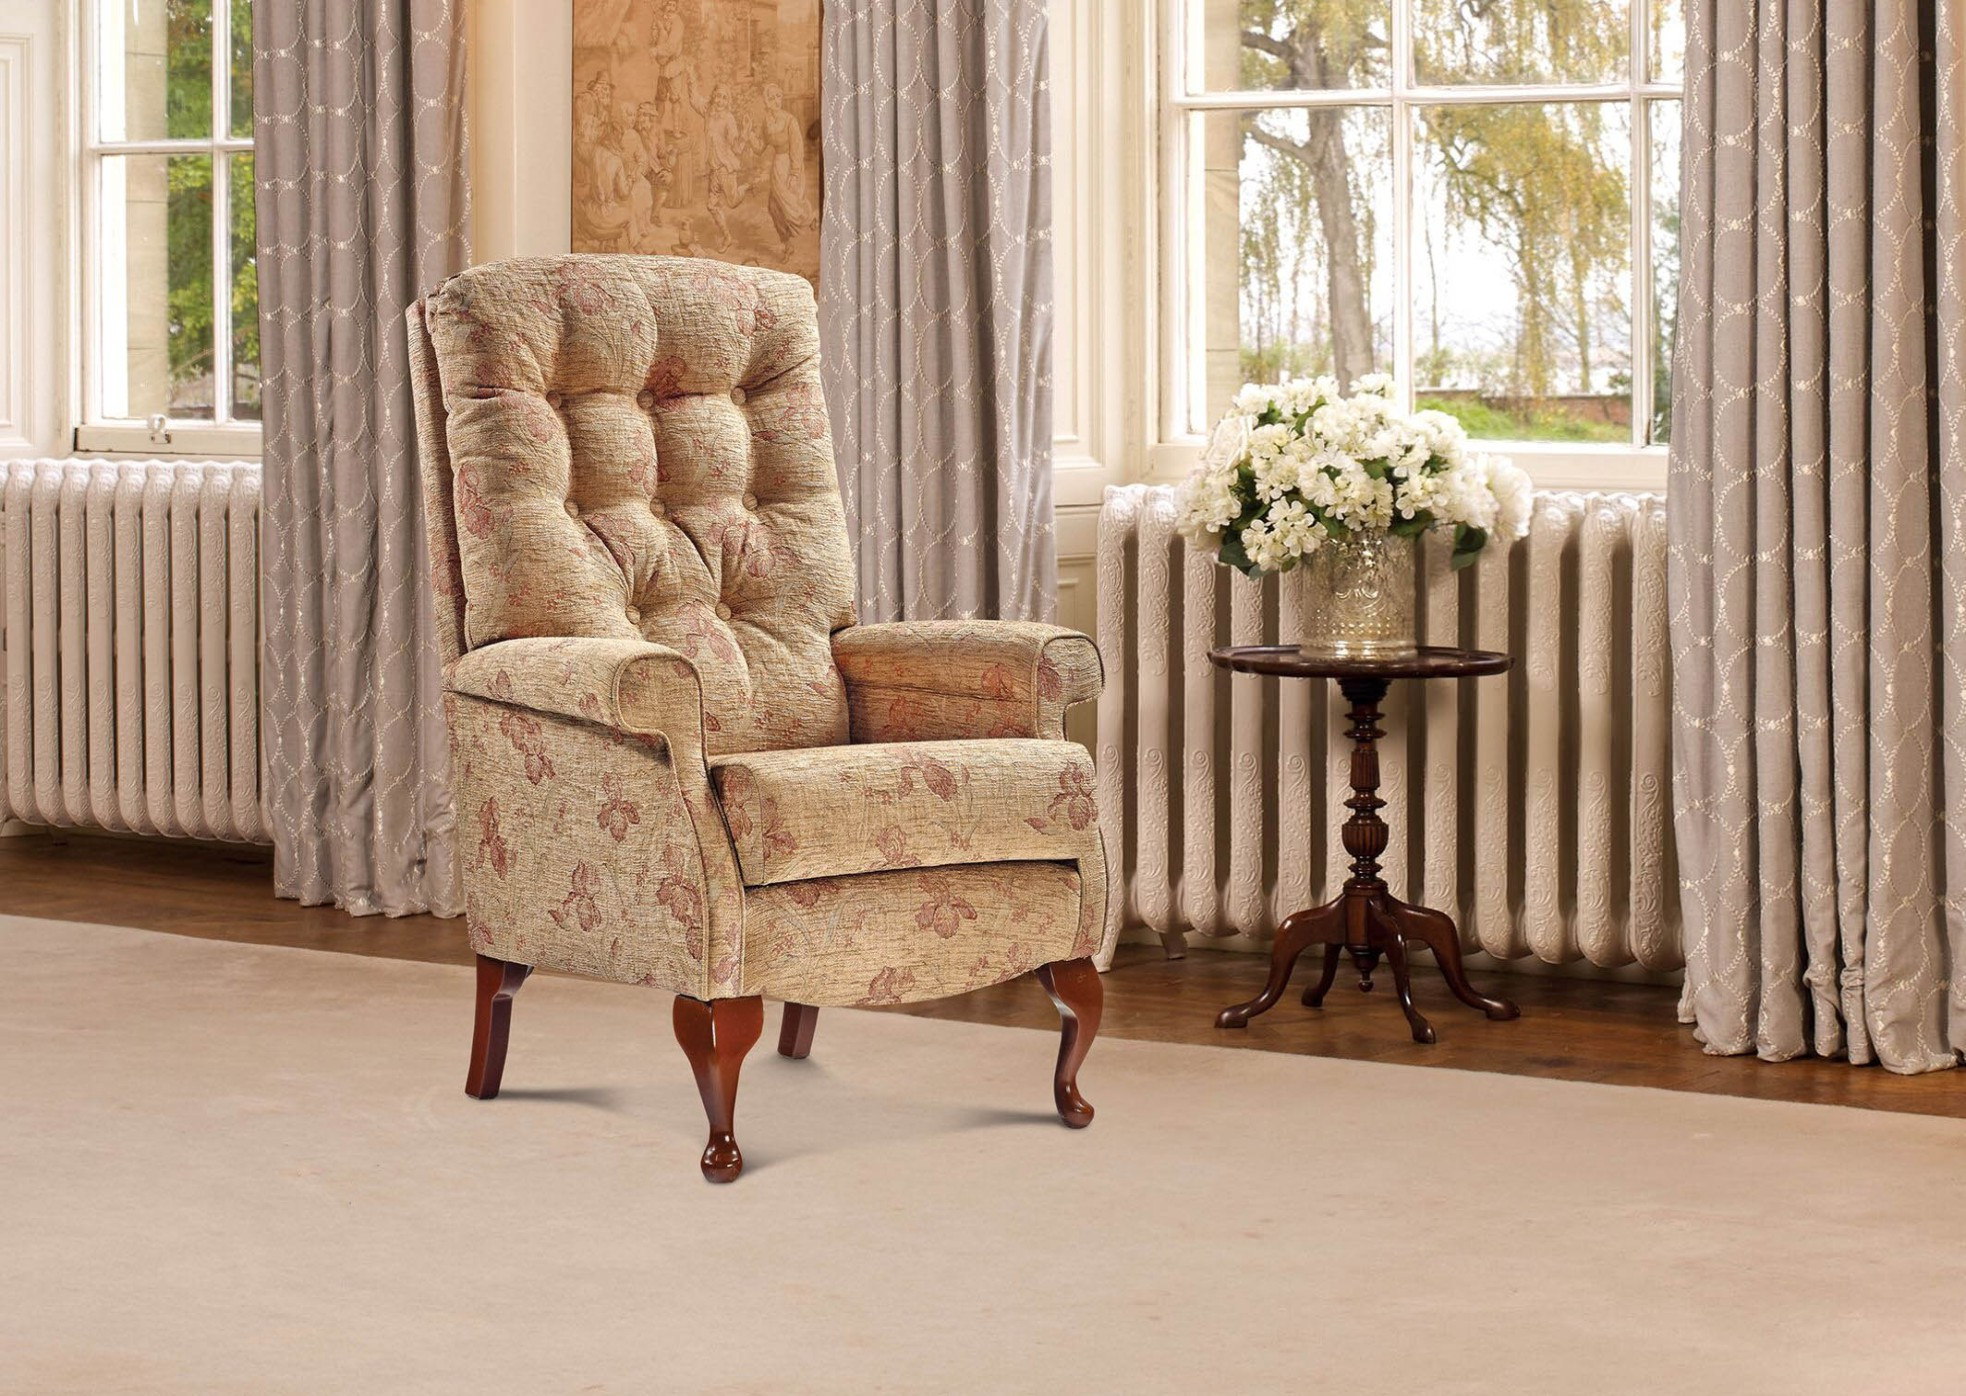 Shildon Standard Seat Fireside Chair